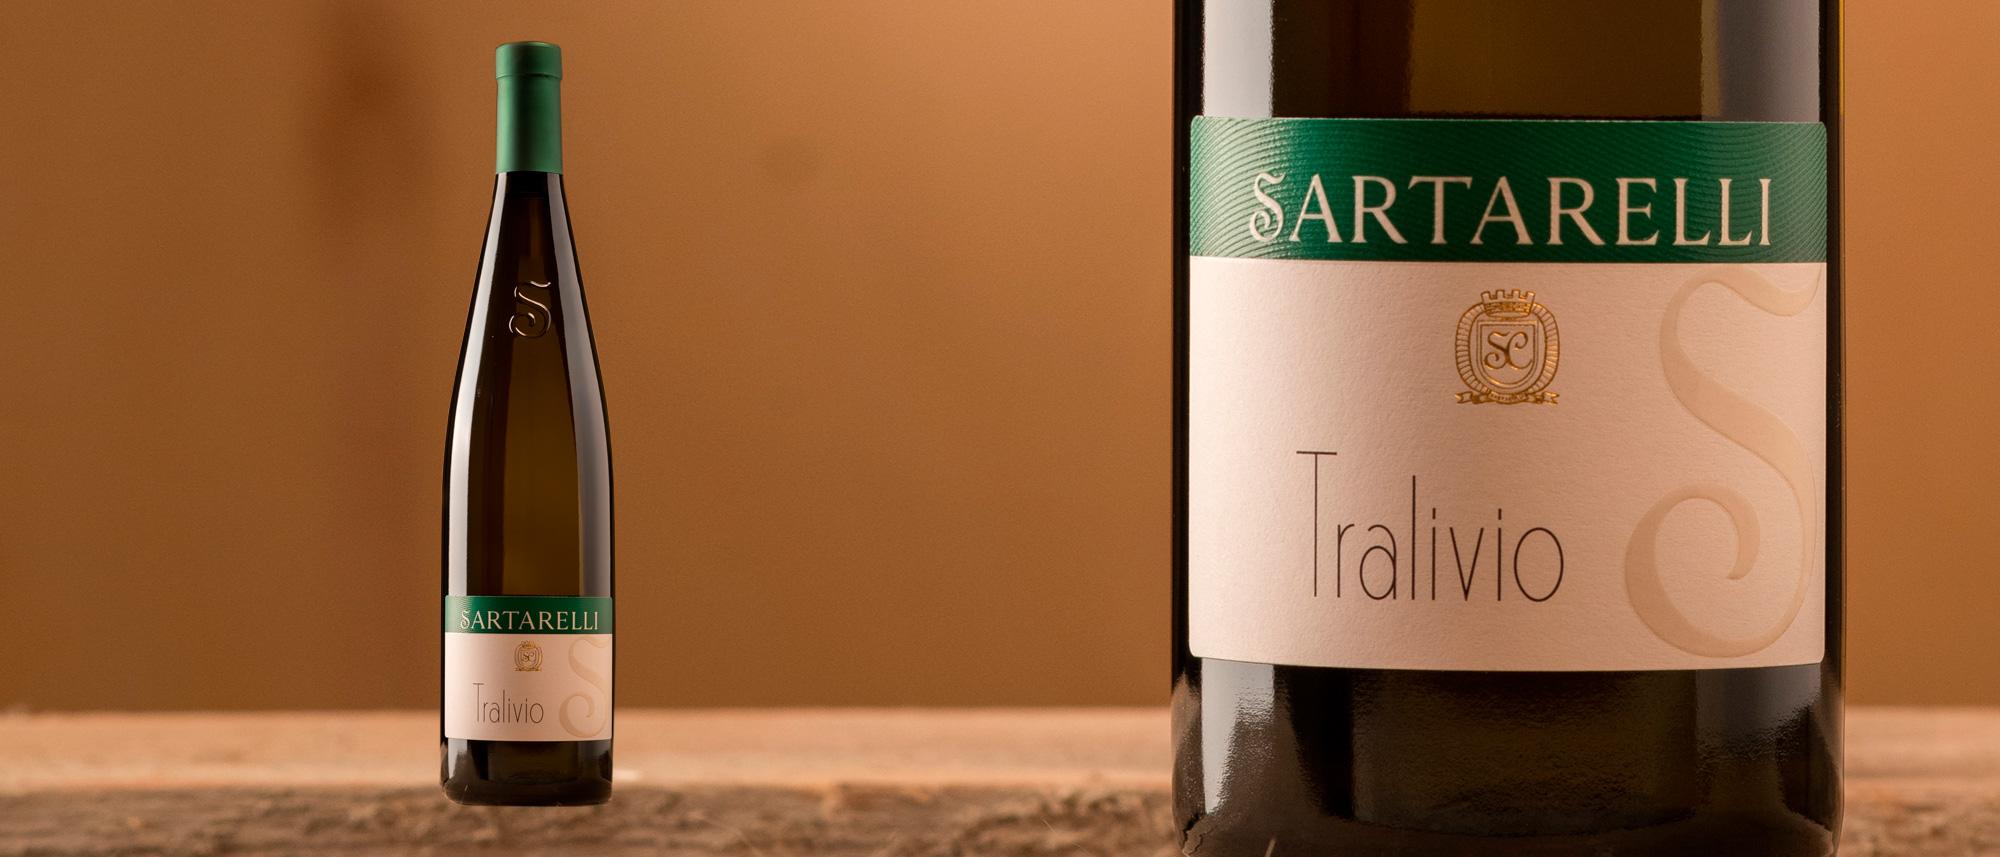 Vino Tralivio Sartarelli